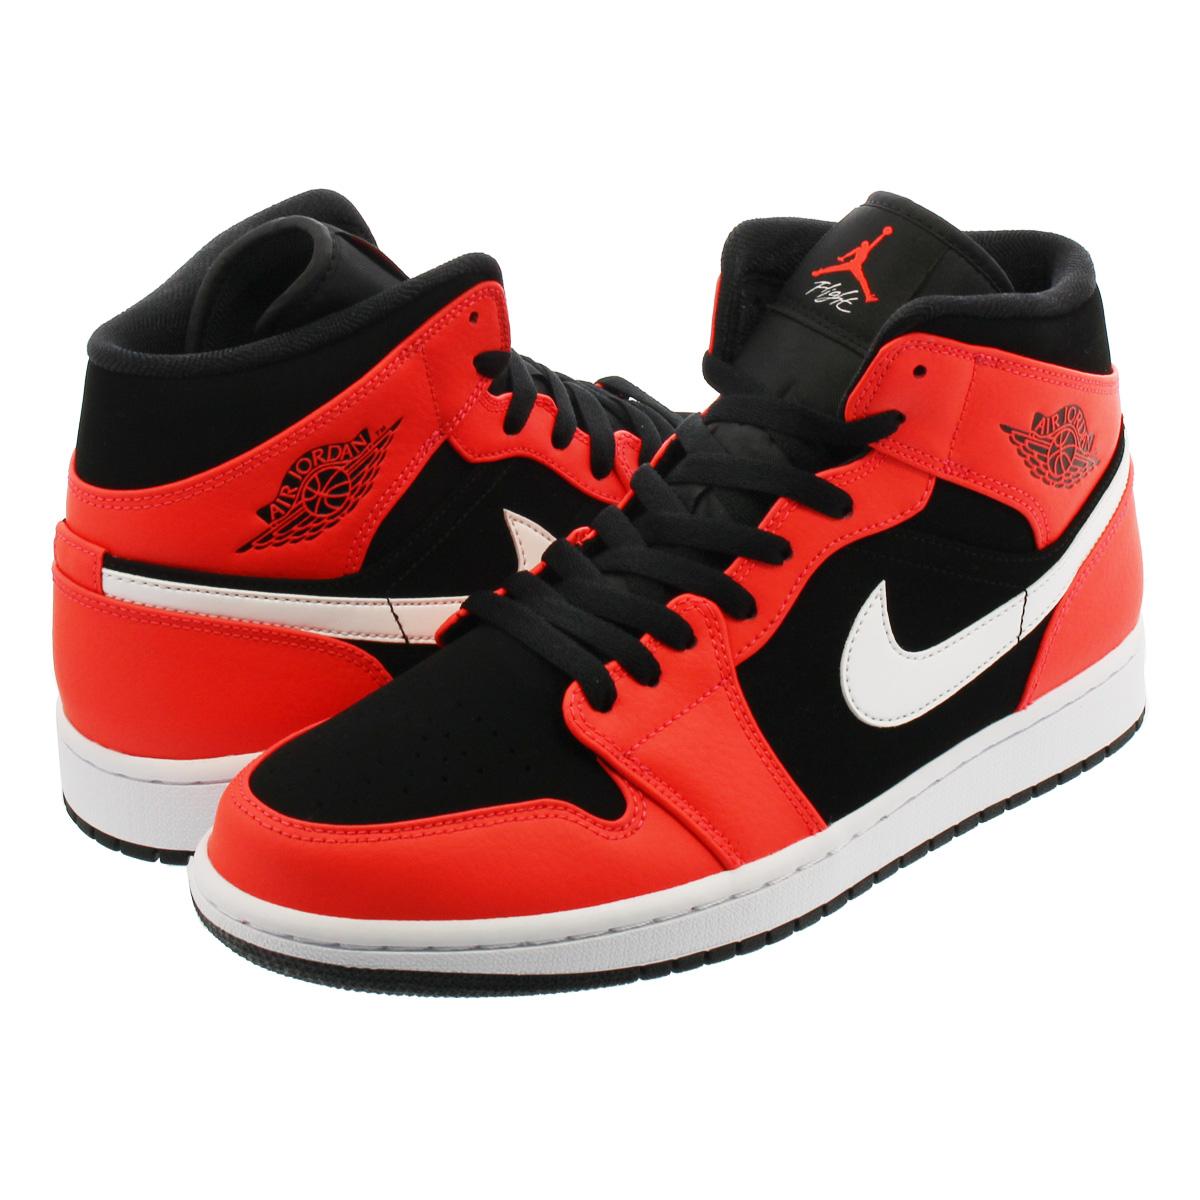 ccfcb684062 NIKE AIR JORDAN 1 MID Nike Air Jordan 1 mid BLACK/INFRARED 23/WHITE ...